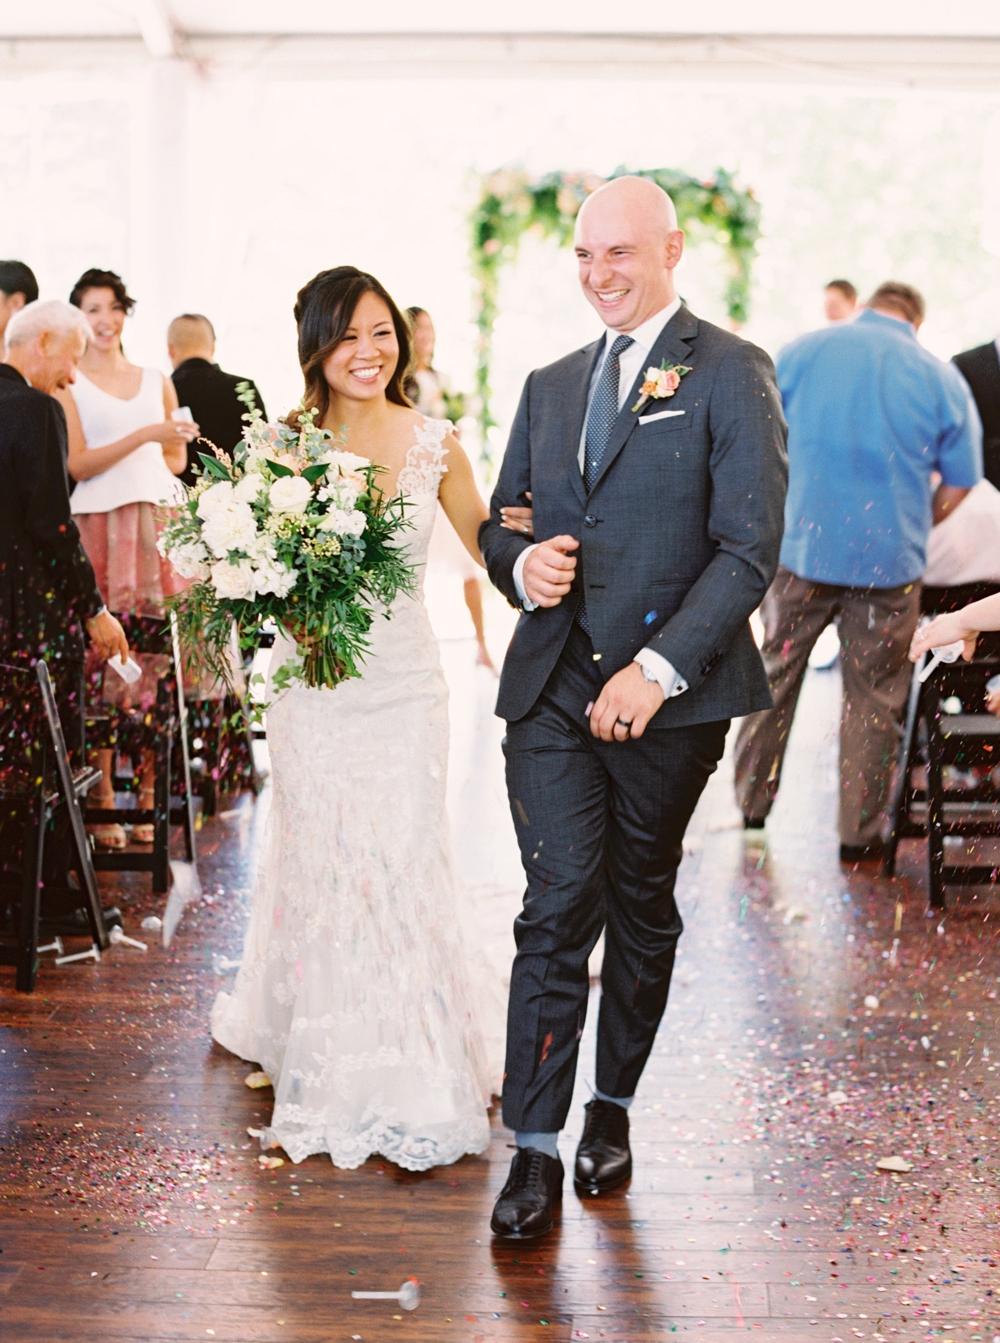 Calgary Wedding Photographer | Meadow Muse Pavilion Wedding | Canmore Photographers | Fish Creek Park Wedding Ceremony | Tent Wedding